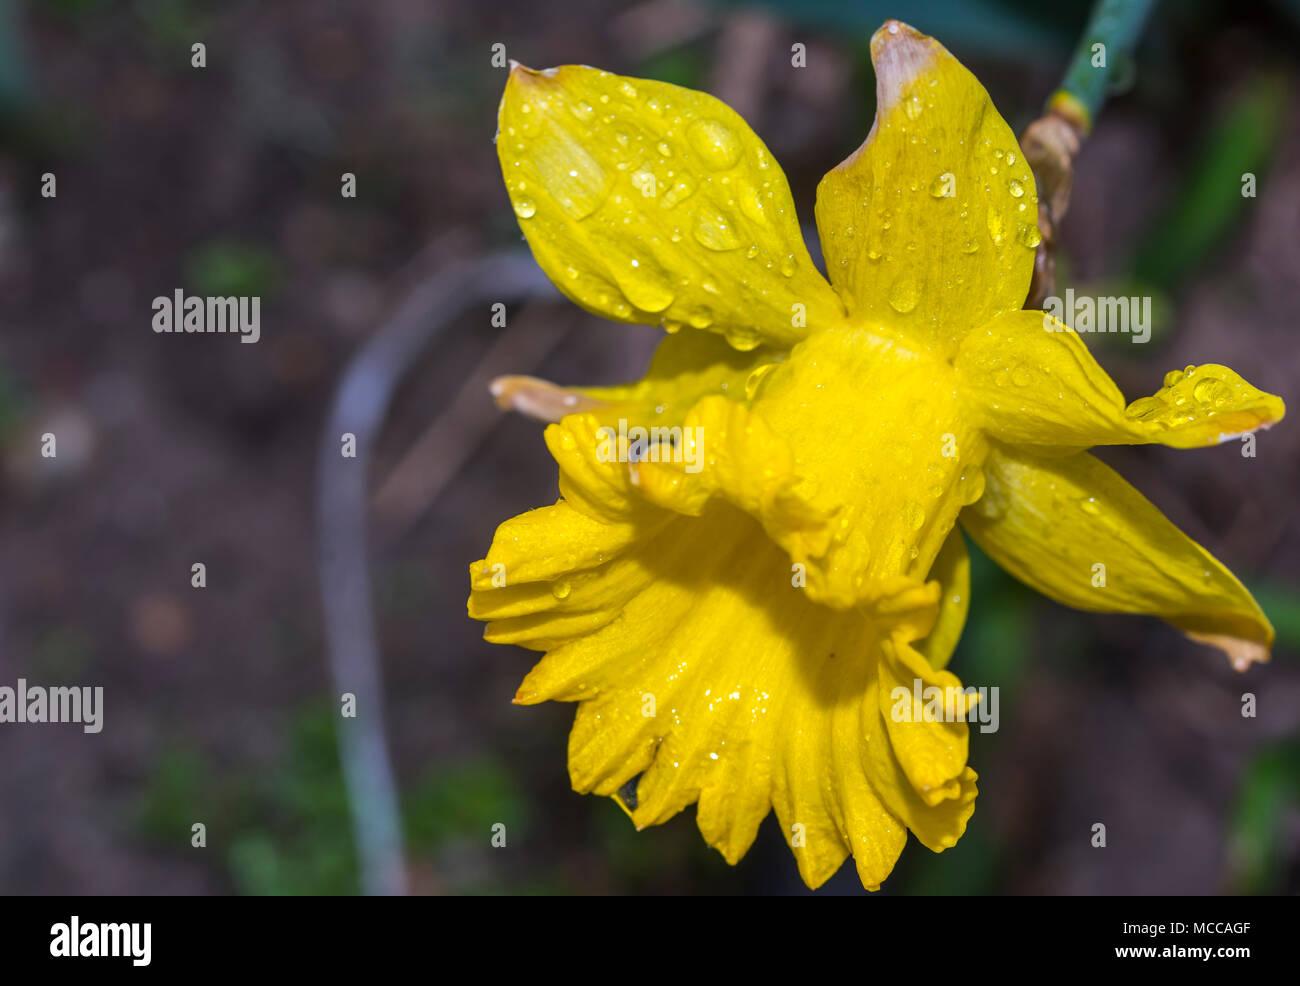 Blooming Yellow Narcissus Flowers Spring Flowers Flowers Blooming